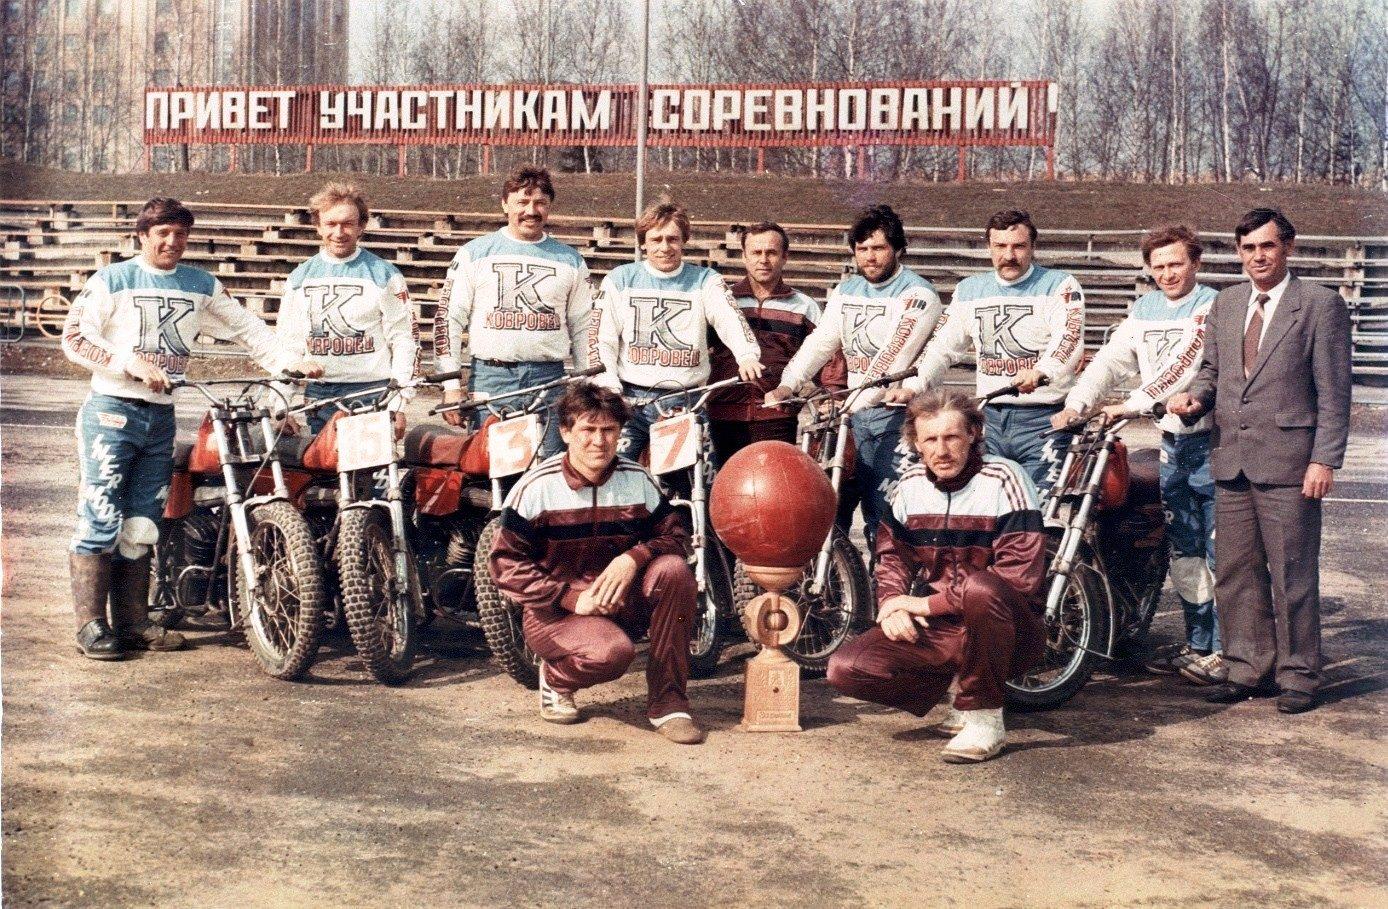 """Ковровец"" (Ковров), 1988 г."